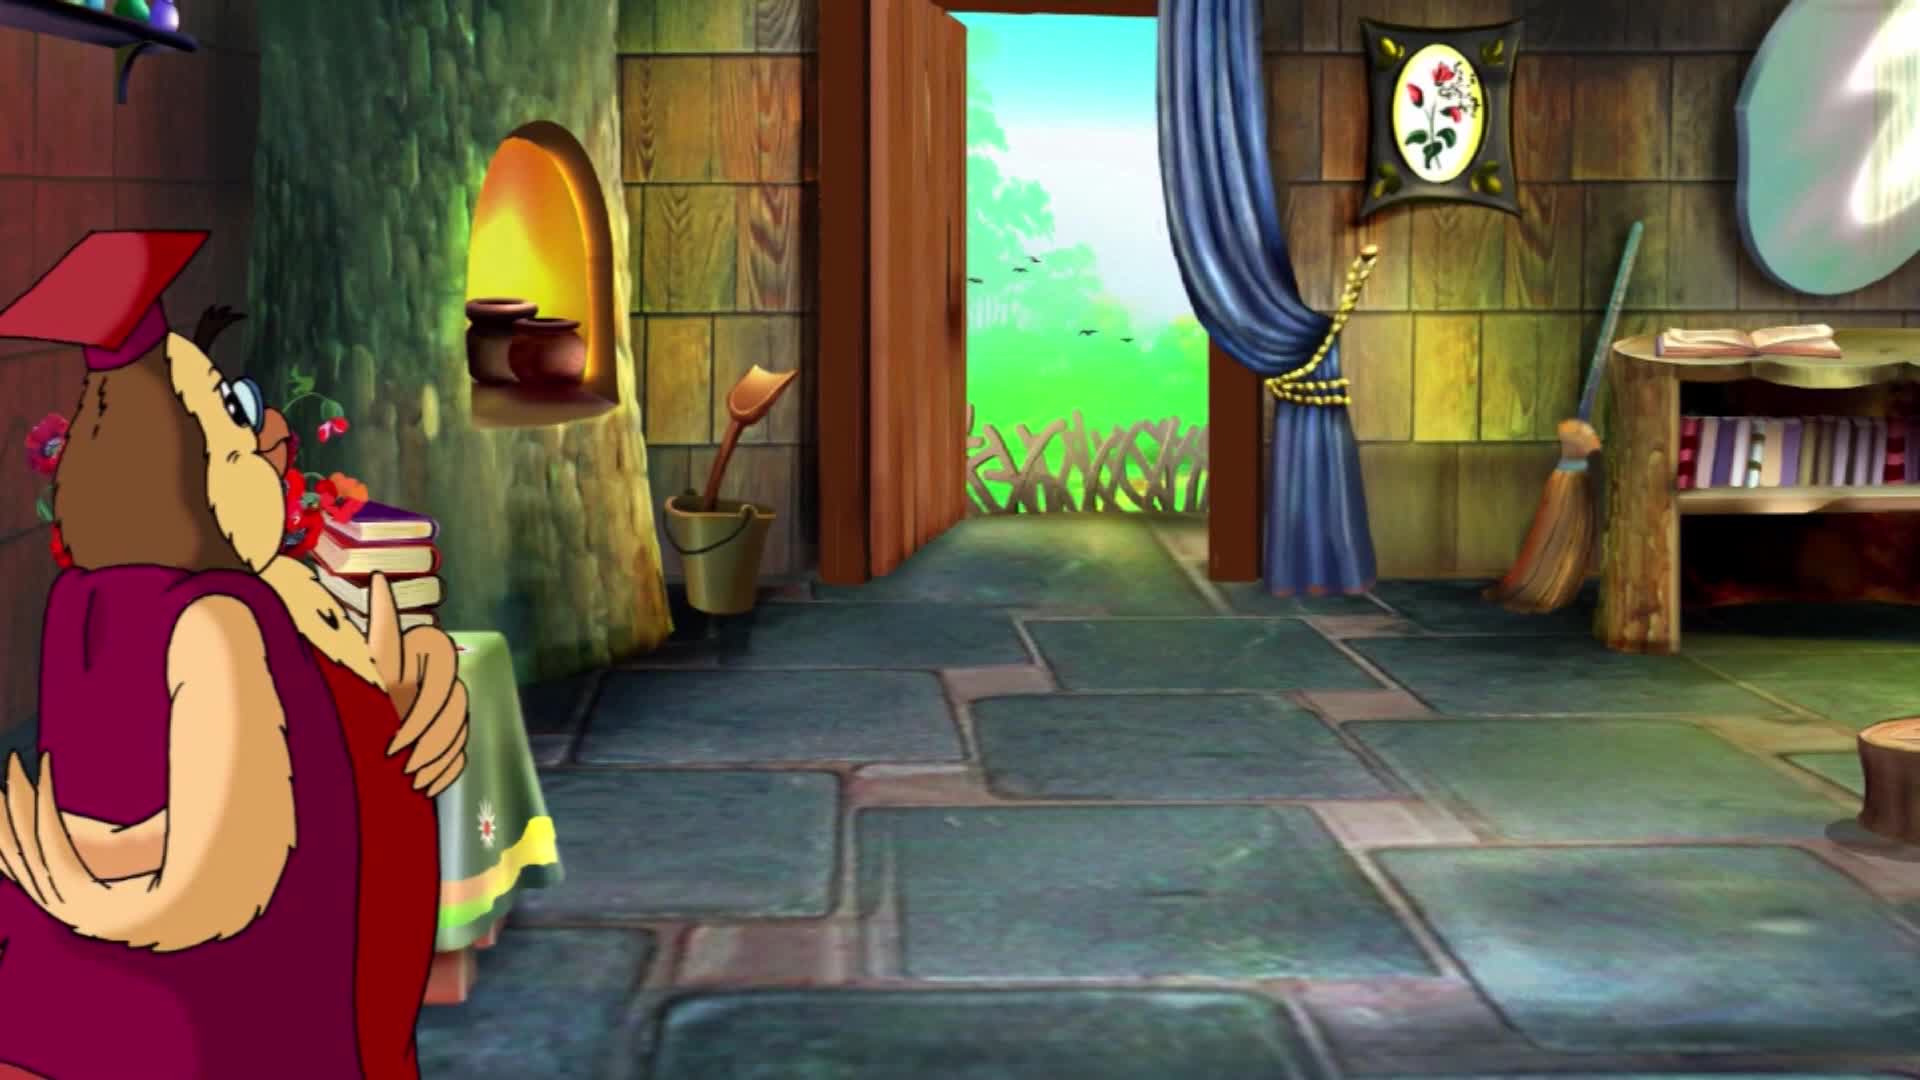 Сказки тетушки Совы Сказки тетушки Совы Маленькие сказки Большого леса (Сказки тетушки Совы)